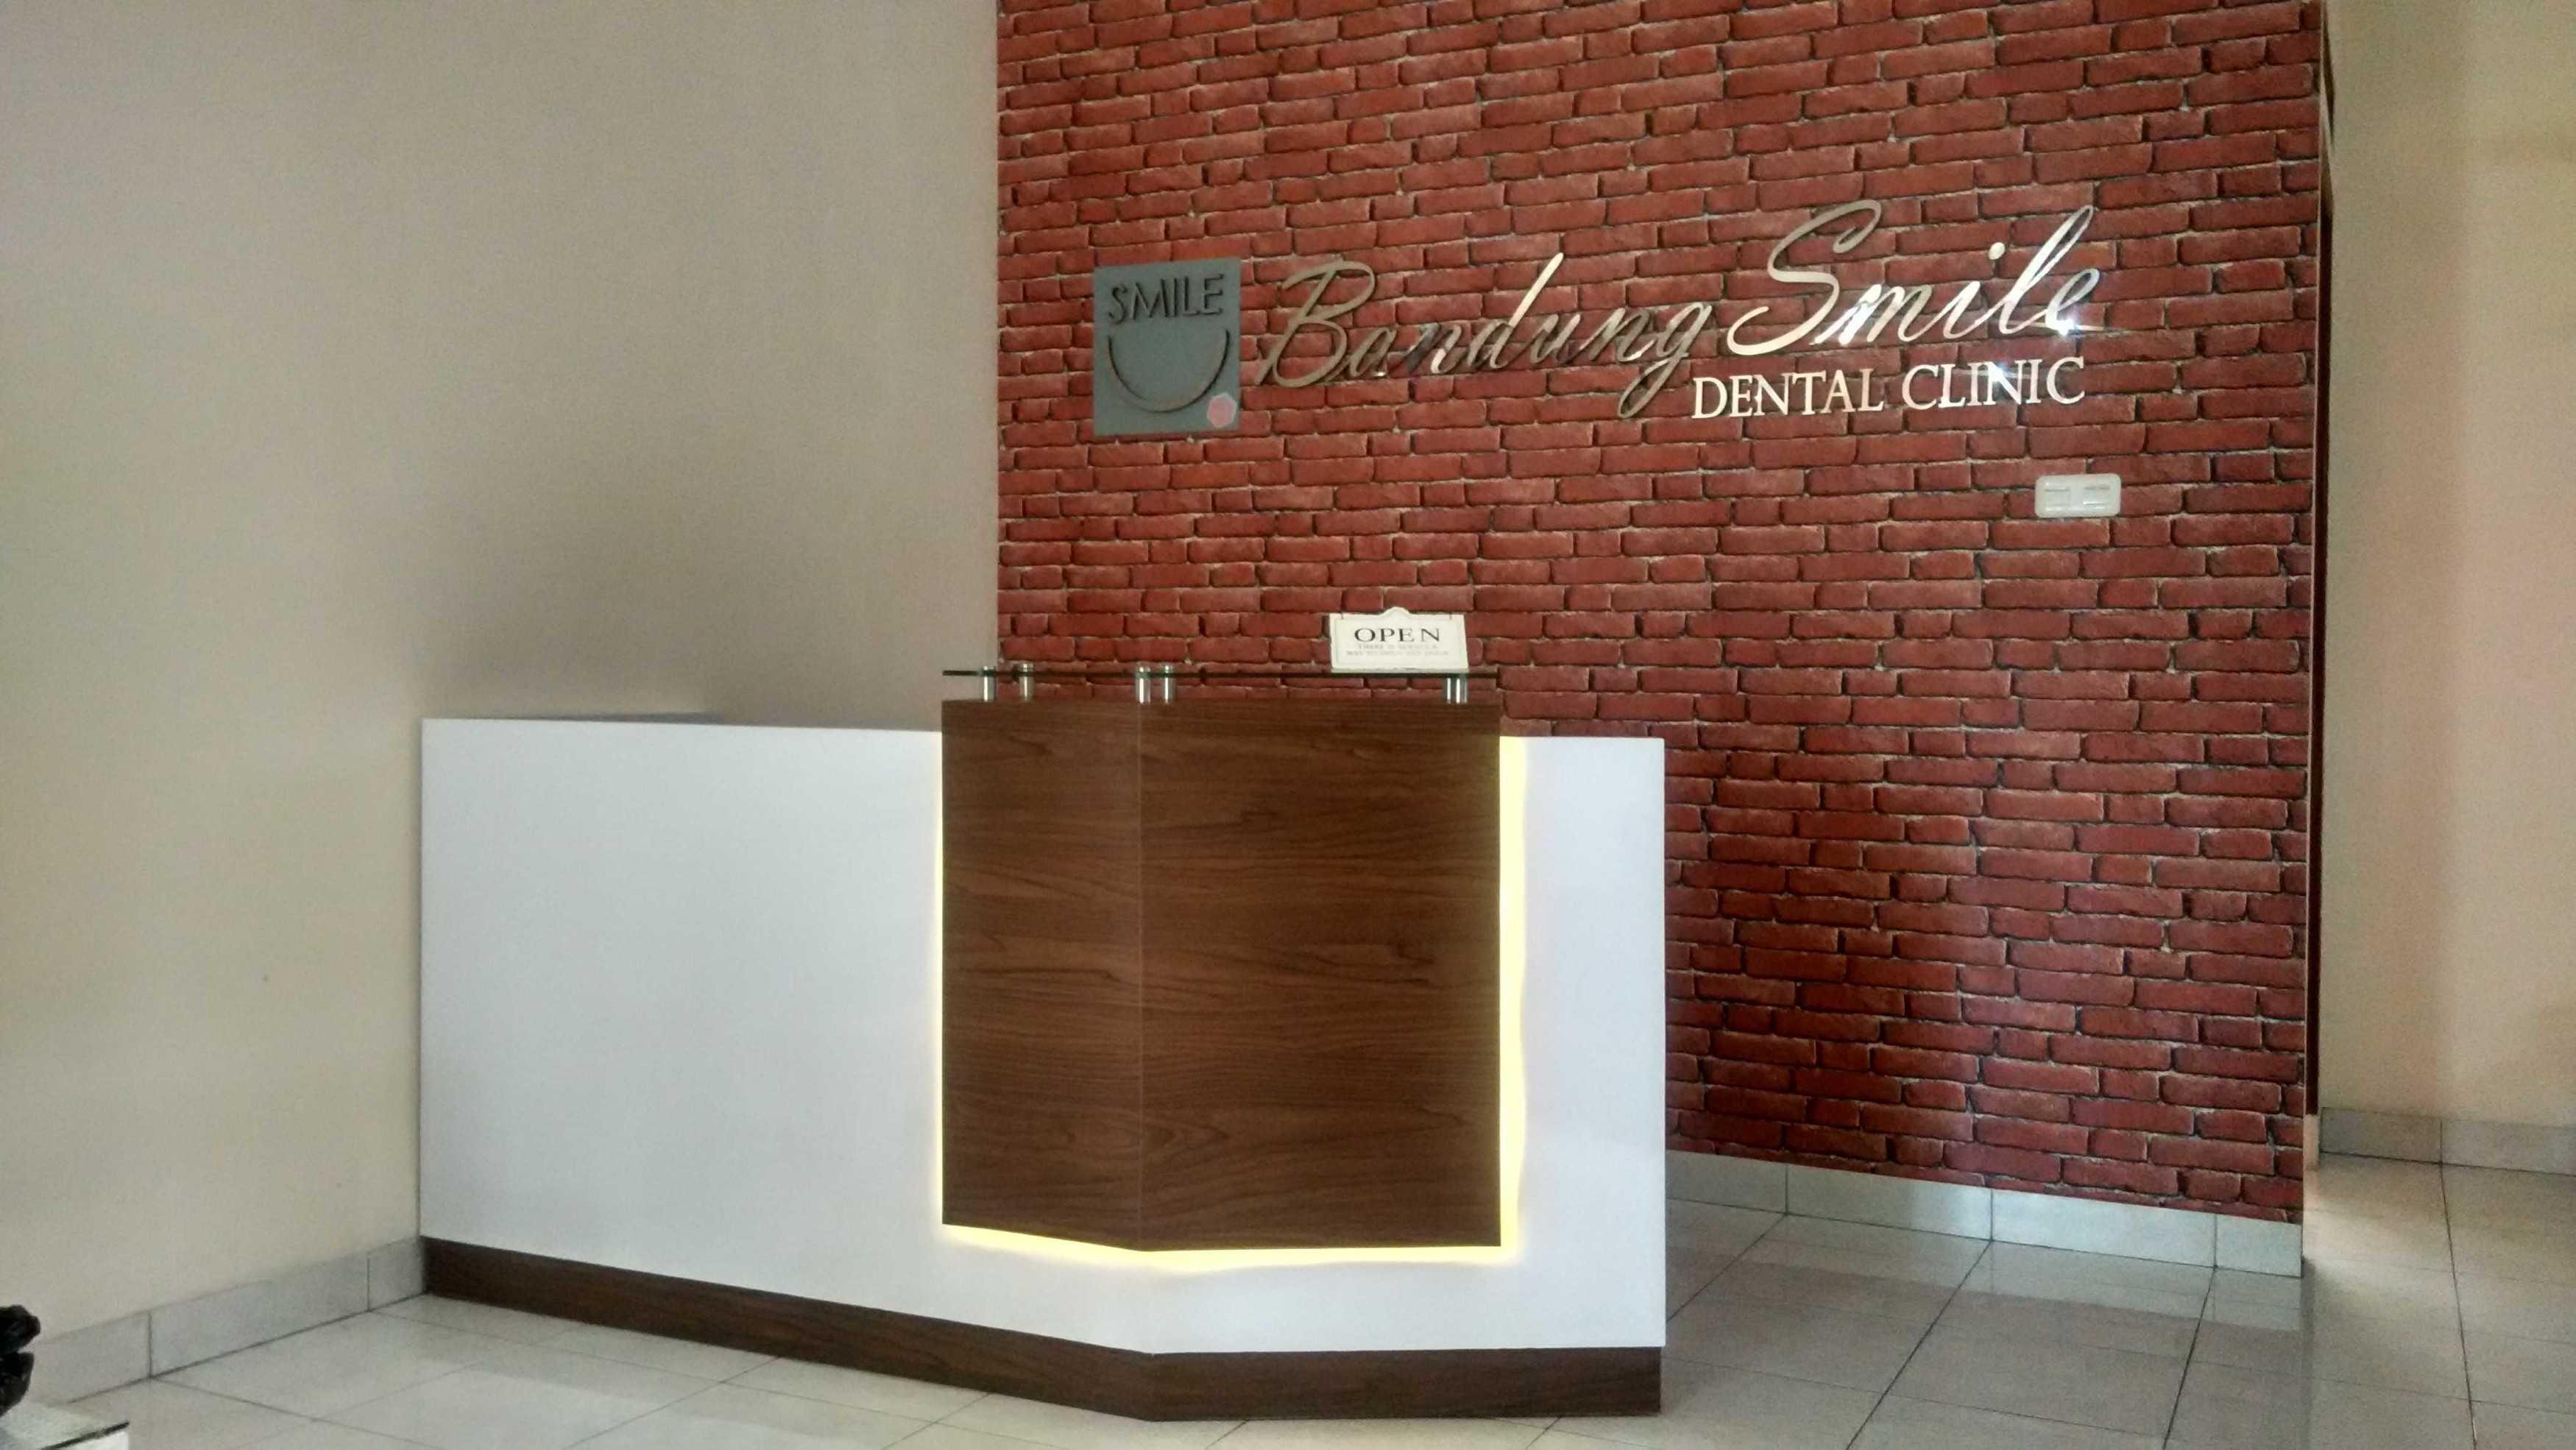 4 Sisi Indonesia Interior Dental Clinic Bandung, Bandung City, West Java, Indonesia  Img20161121112235Hdr   33419